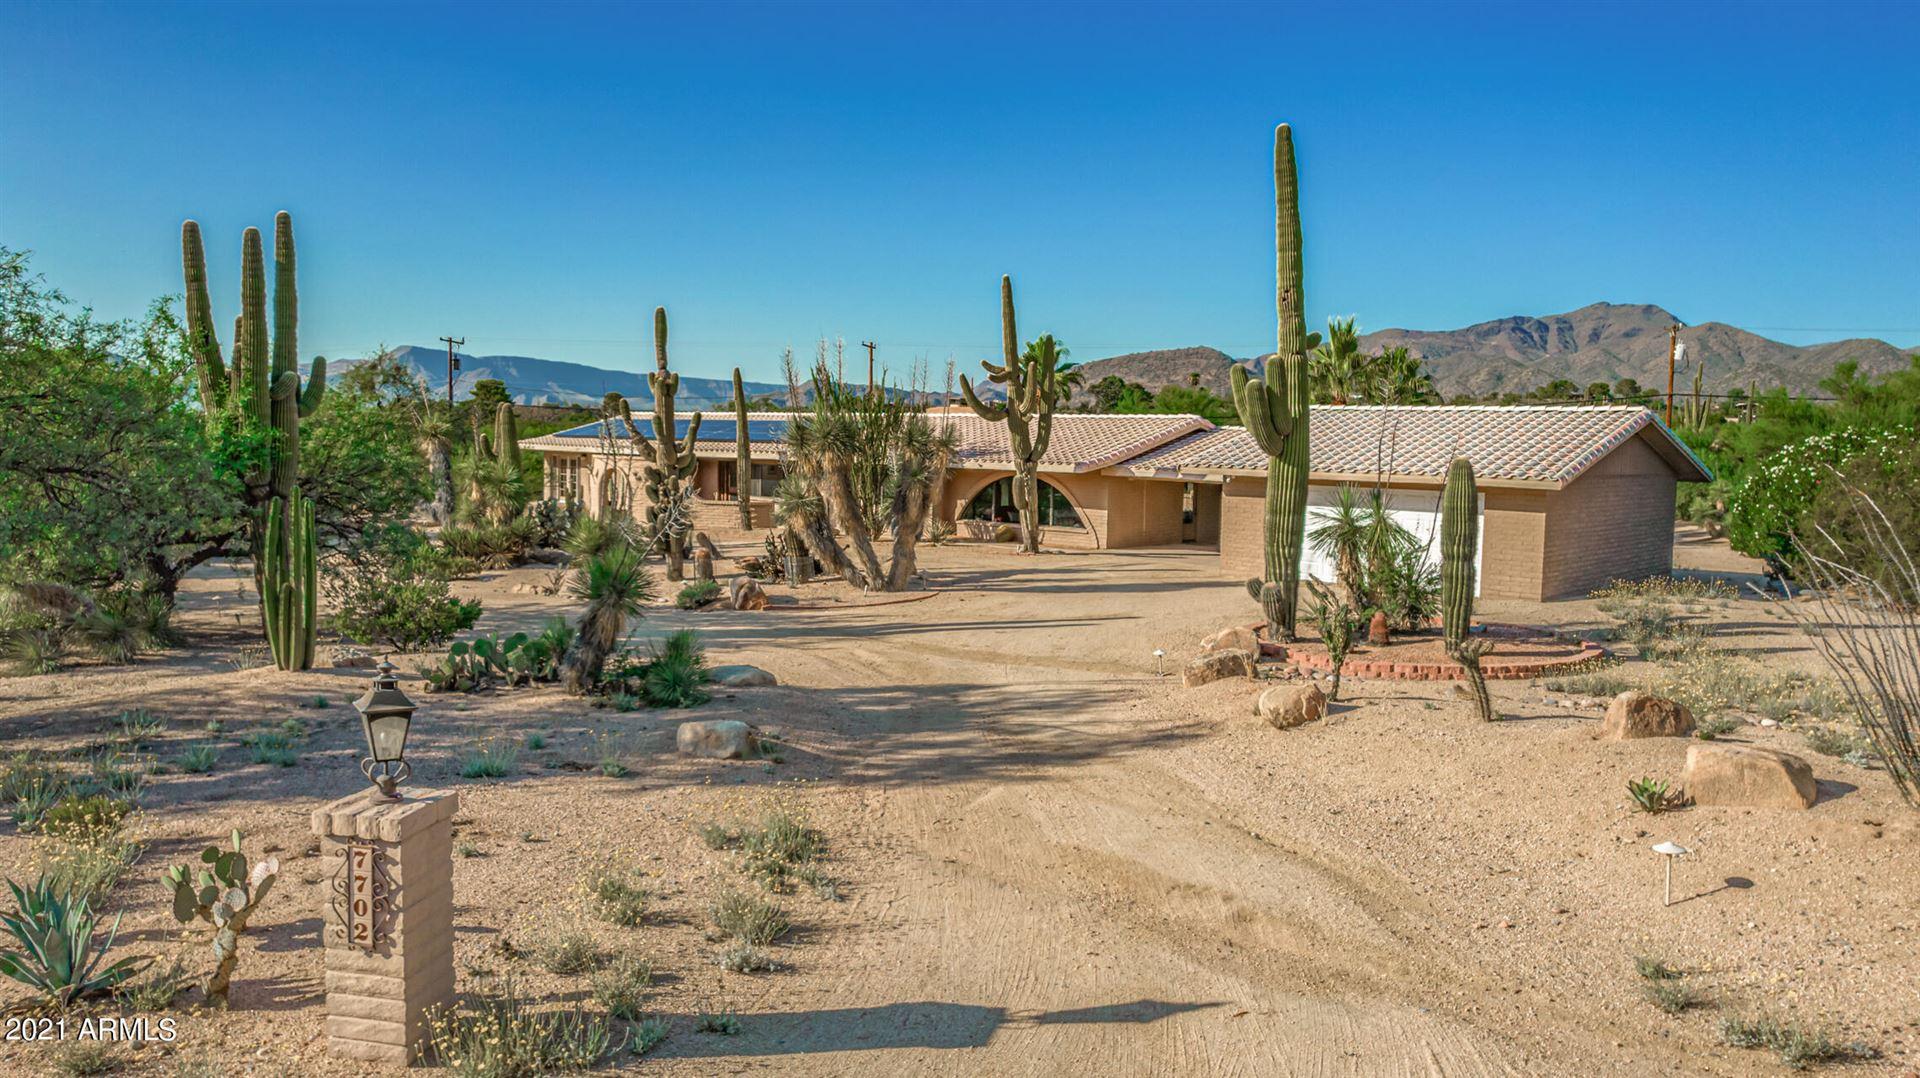 Photo of 7702 E ROCKING CHAIR Road, Carefree, AZ 85377 (MLS # 6292589)